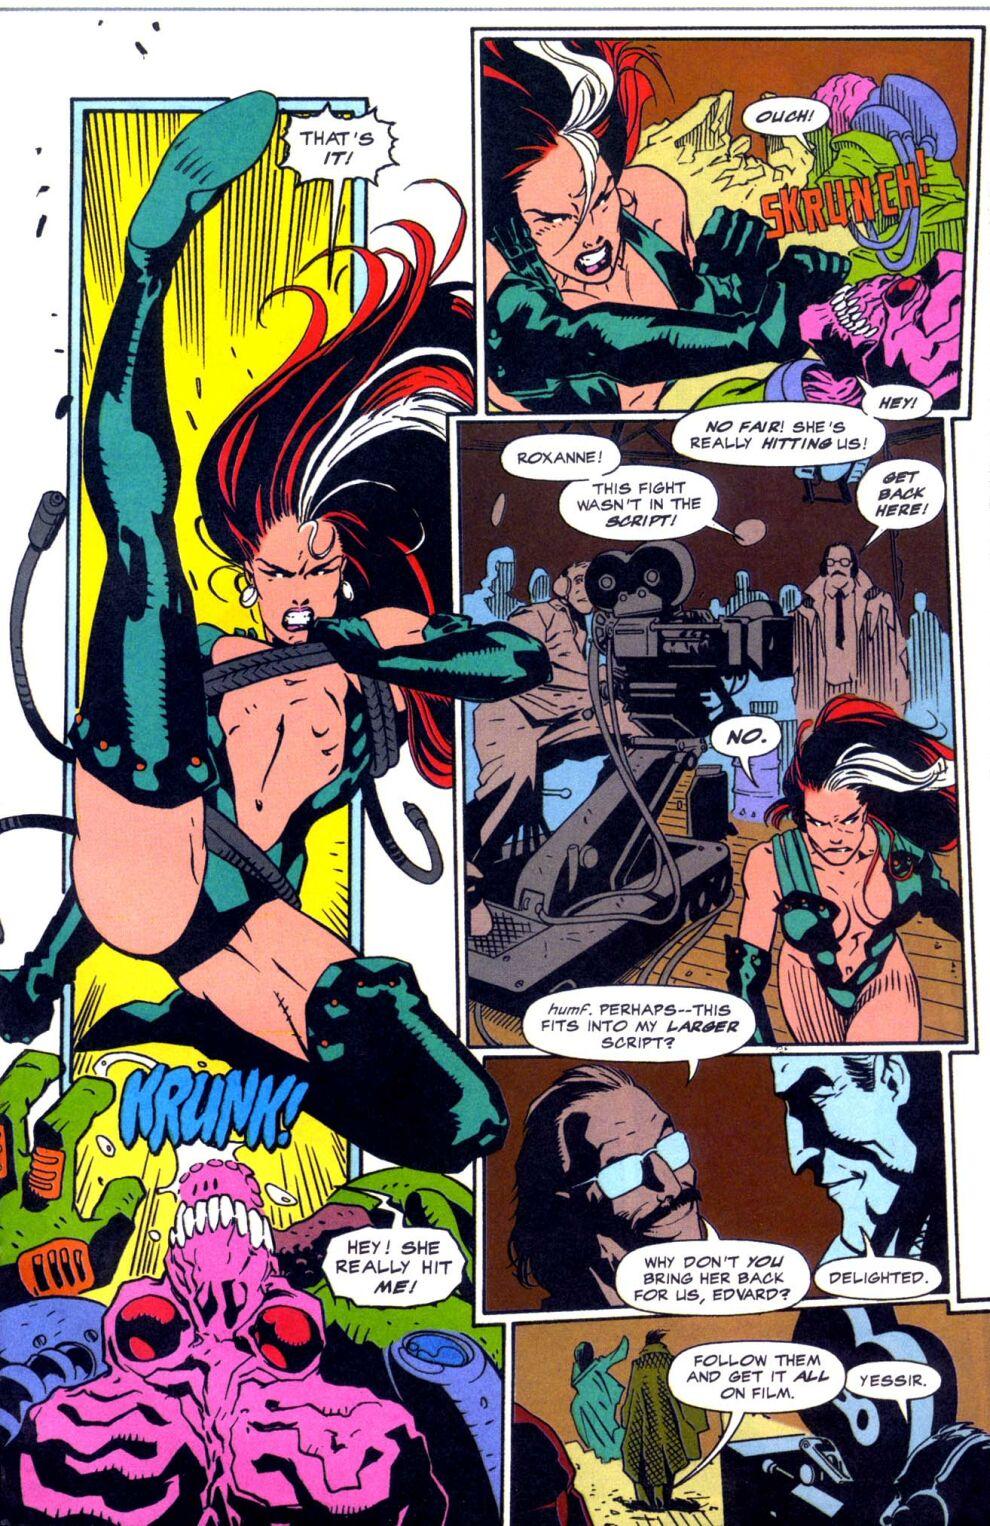 Read online Nightmare comic -  Issue #4 - 7